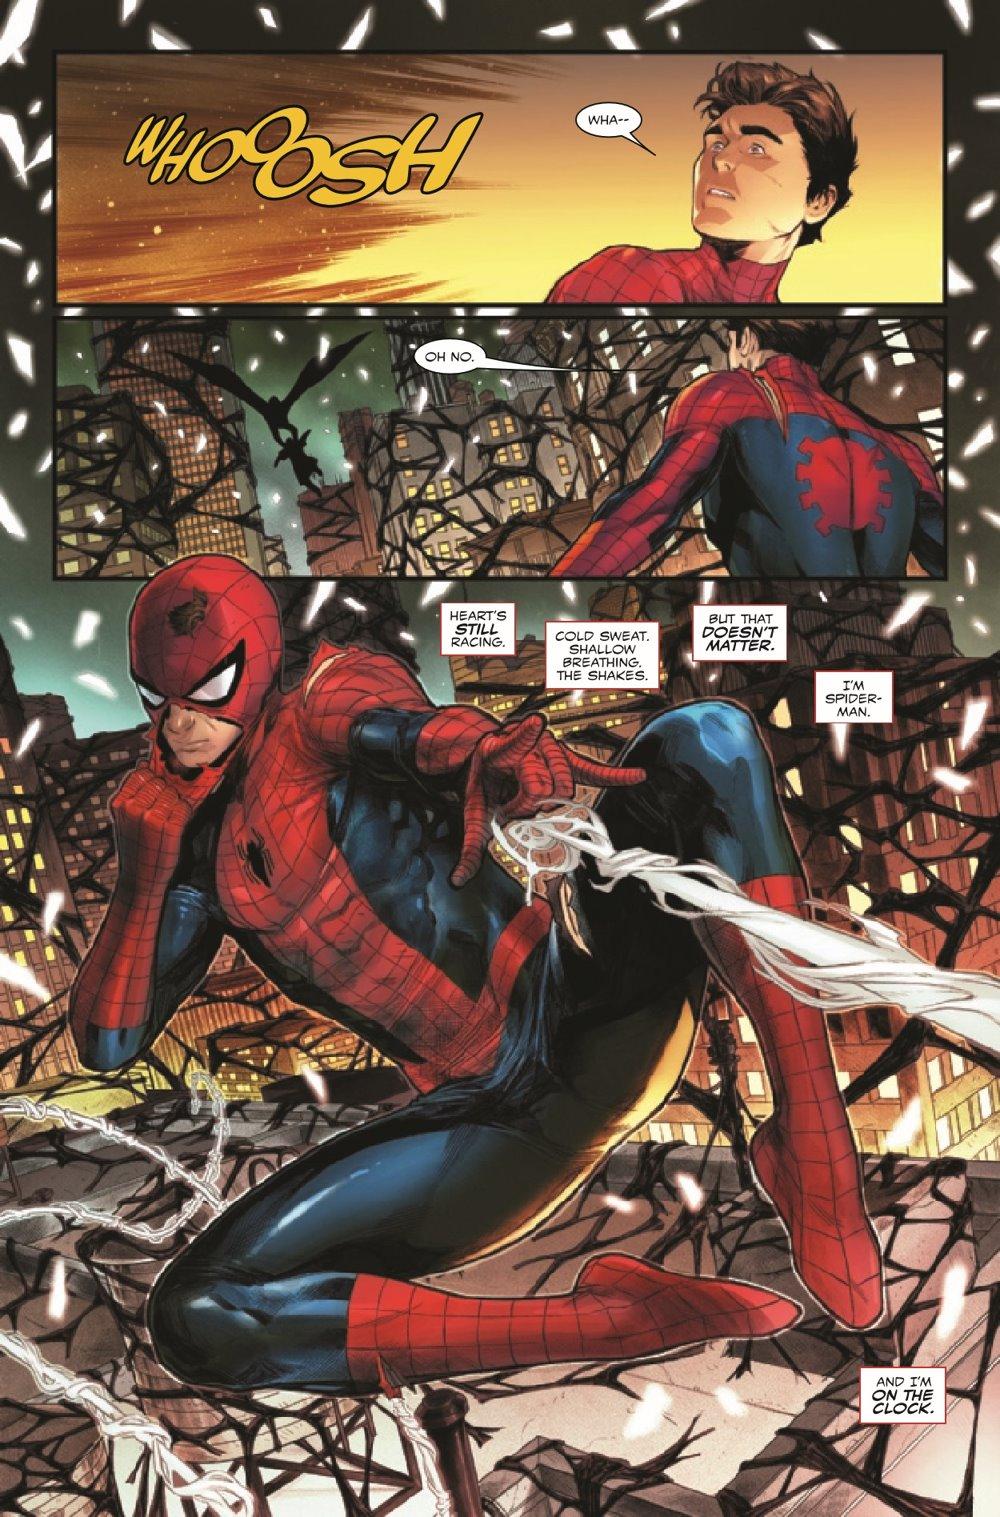 SMKIB2021001_Preview-5 ComicList Previews: KING IN BLACK SPIDER-MAN #1